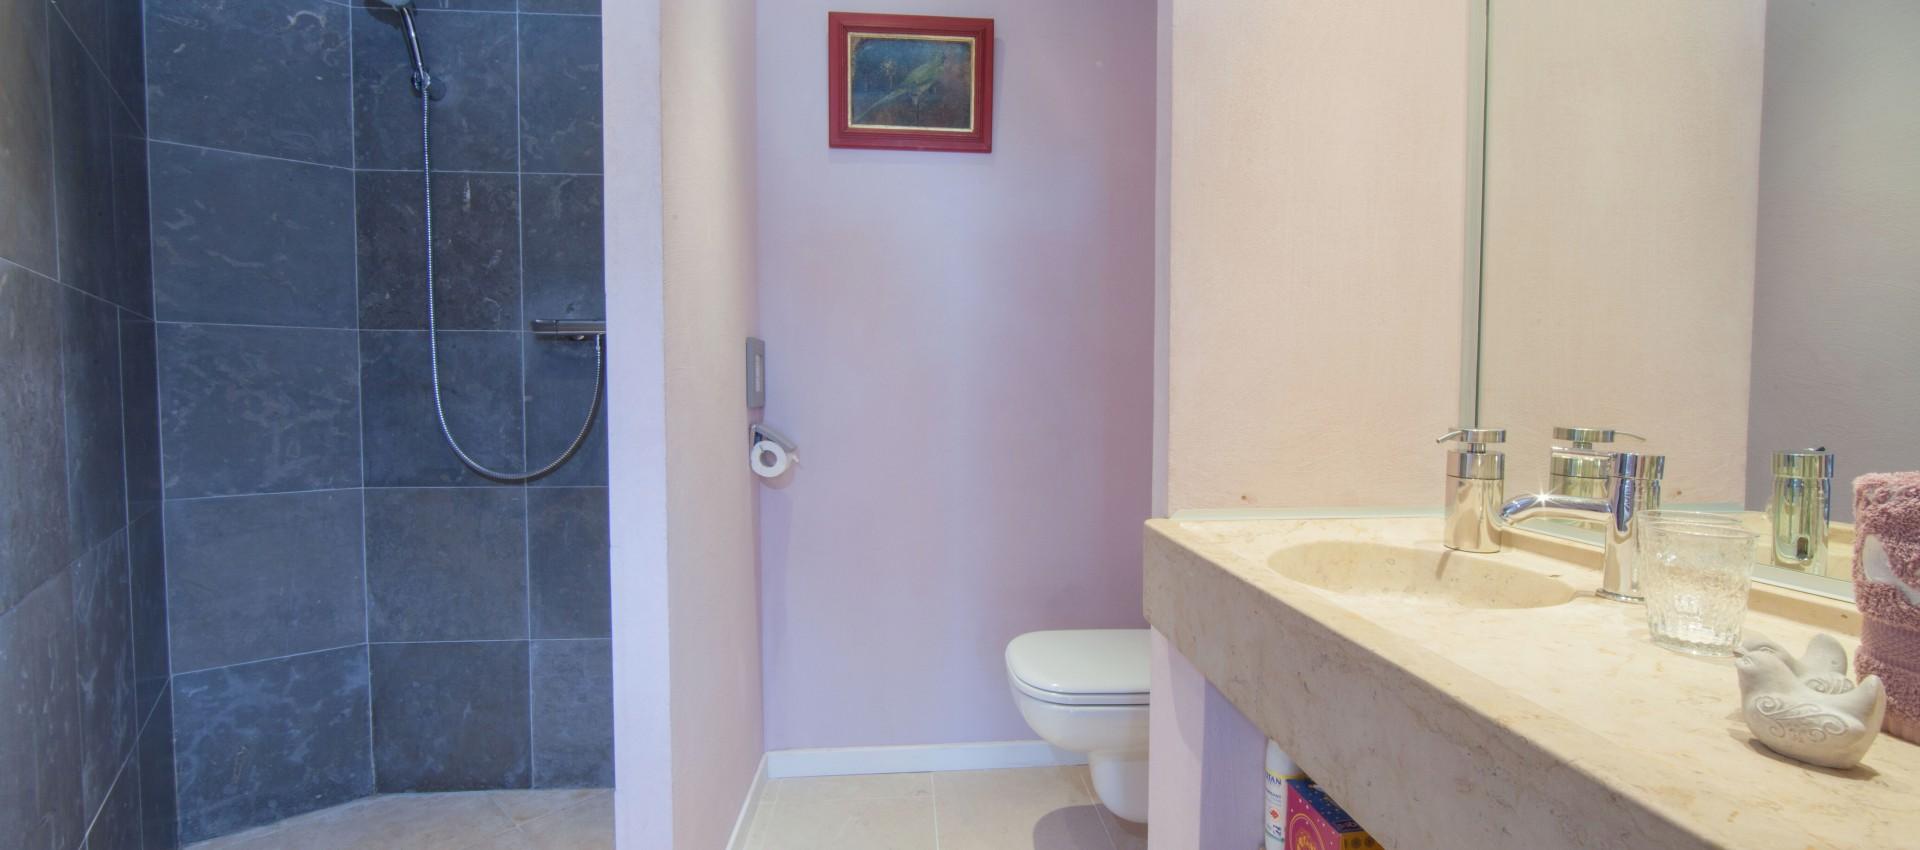 Salle de bain de Tourmaline